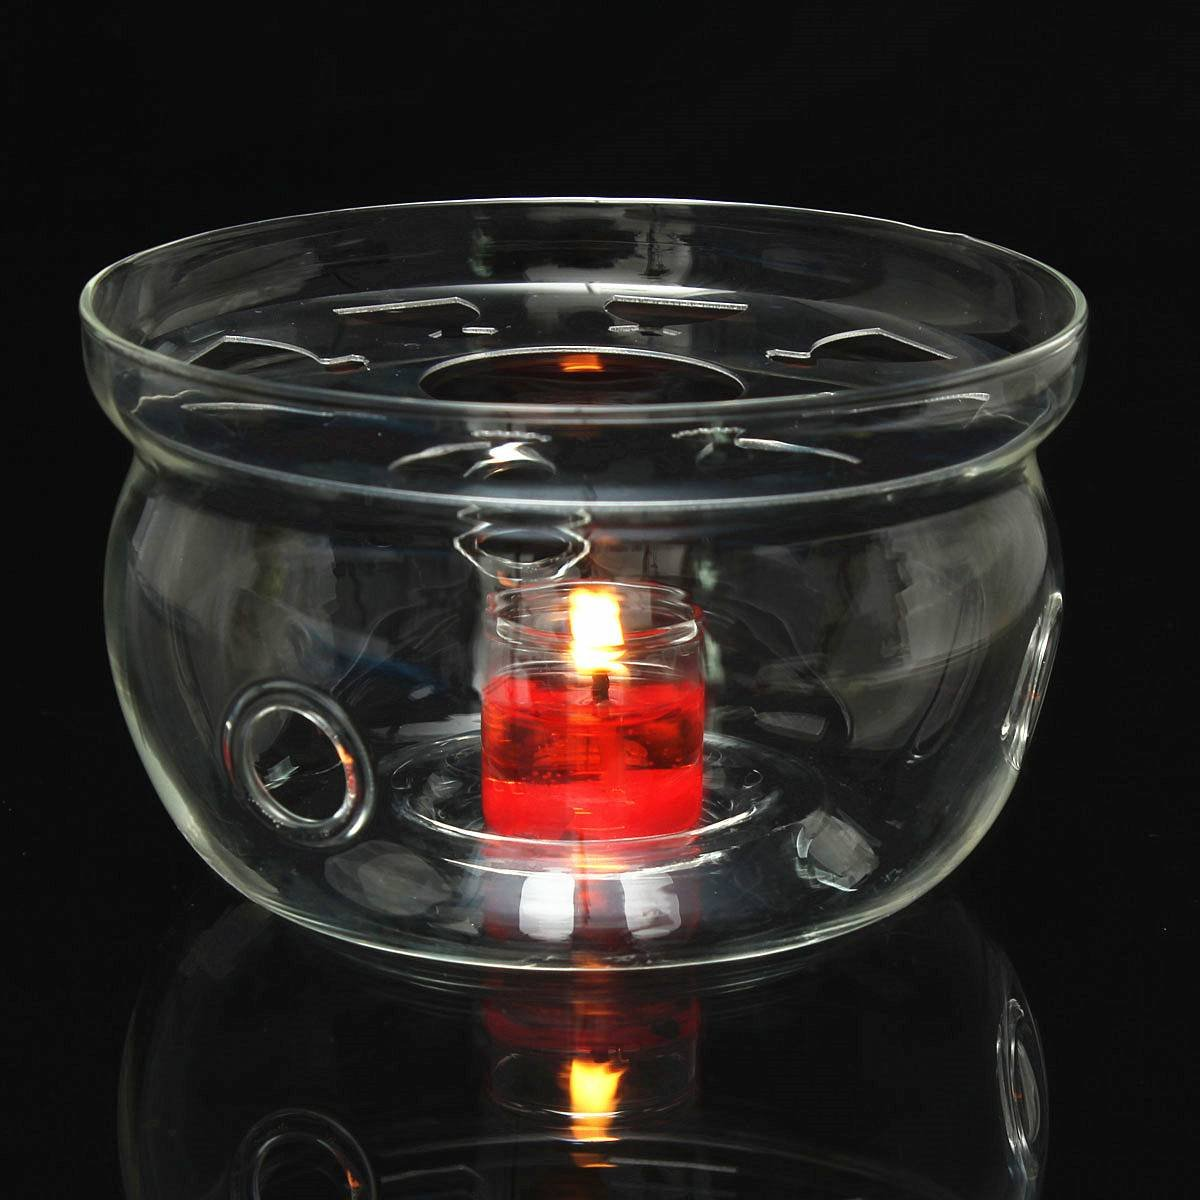 KINGSO Glass Teapot Warmer Heating Base Clear 12676mm